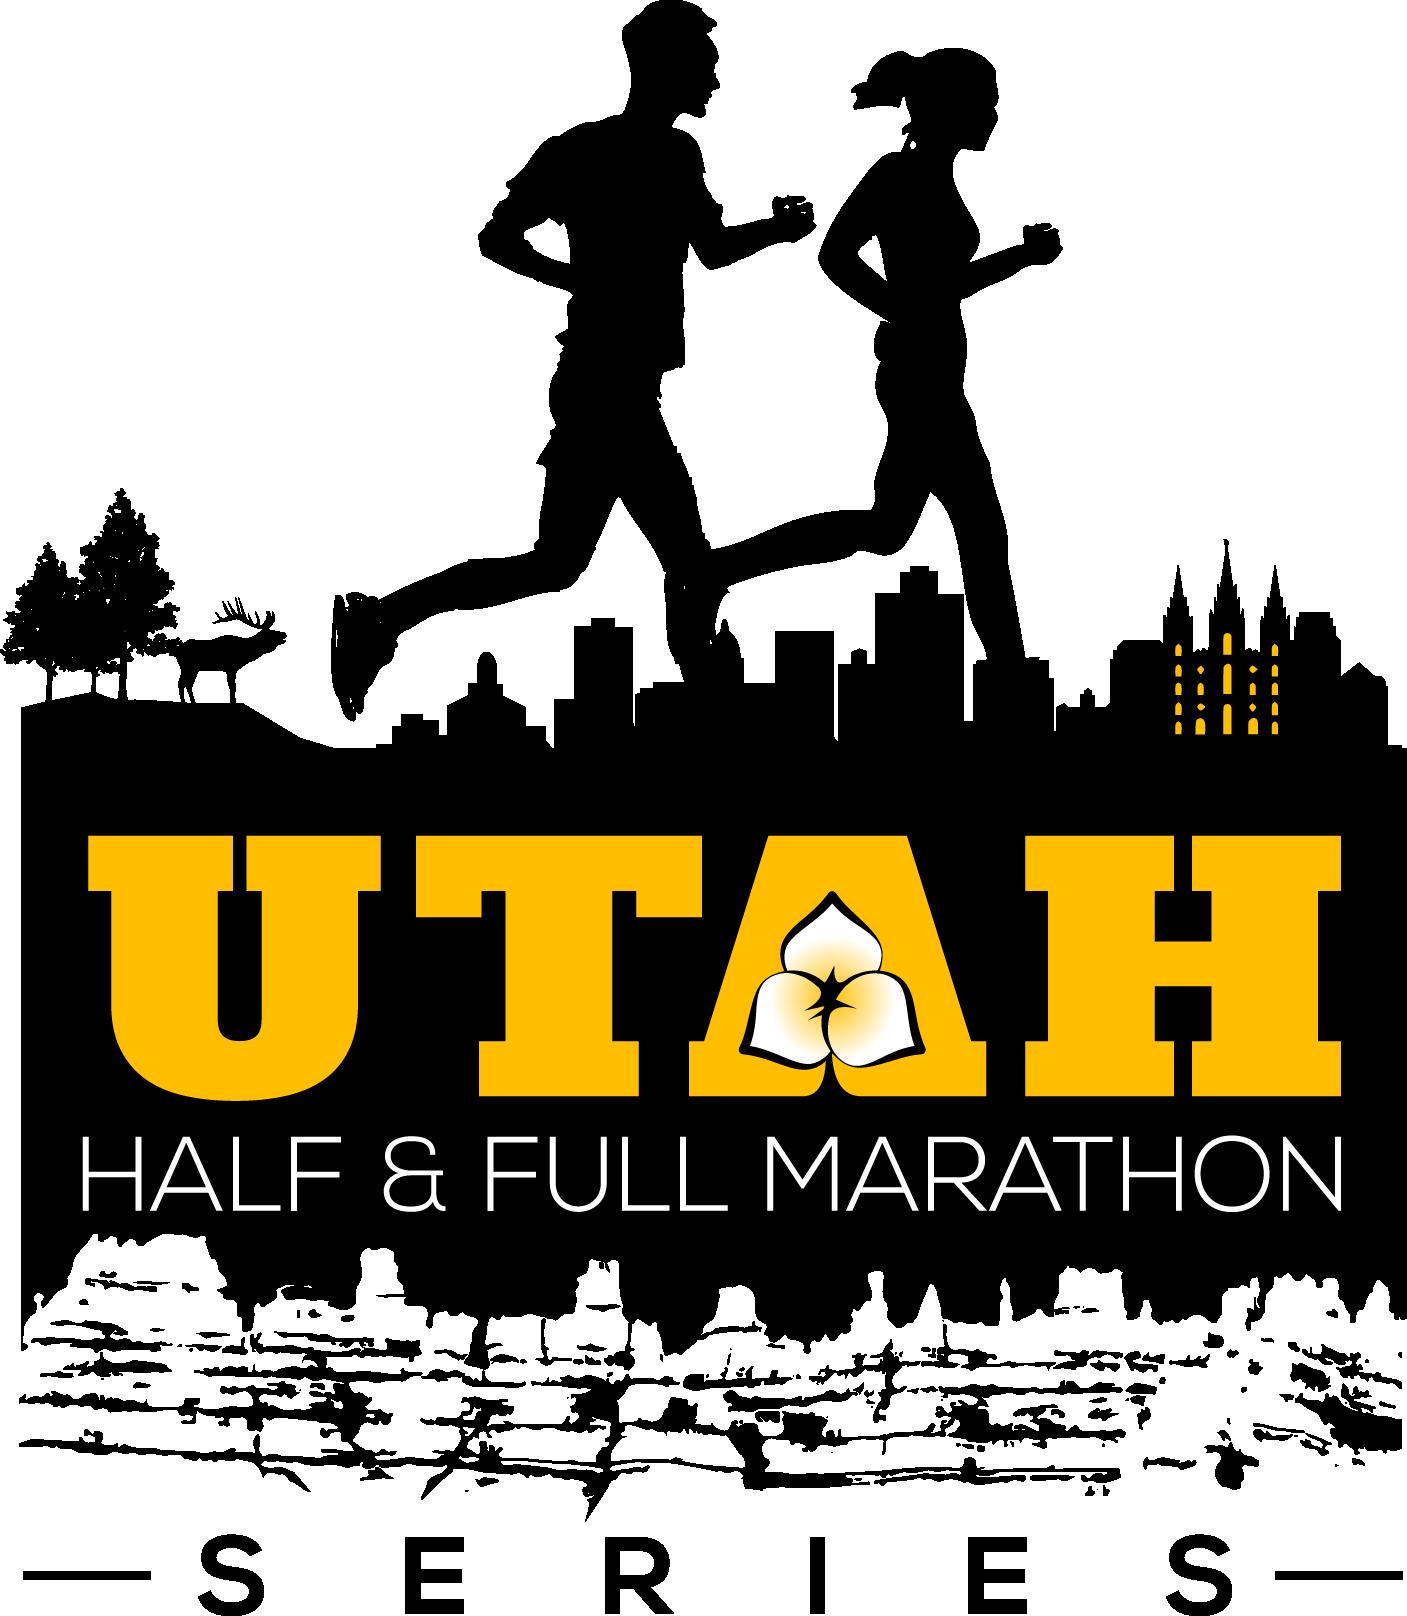 washington-city-half-marathon-sponsor